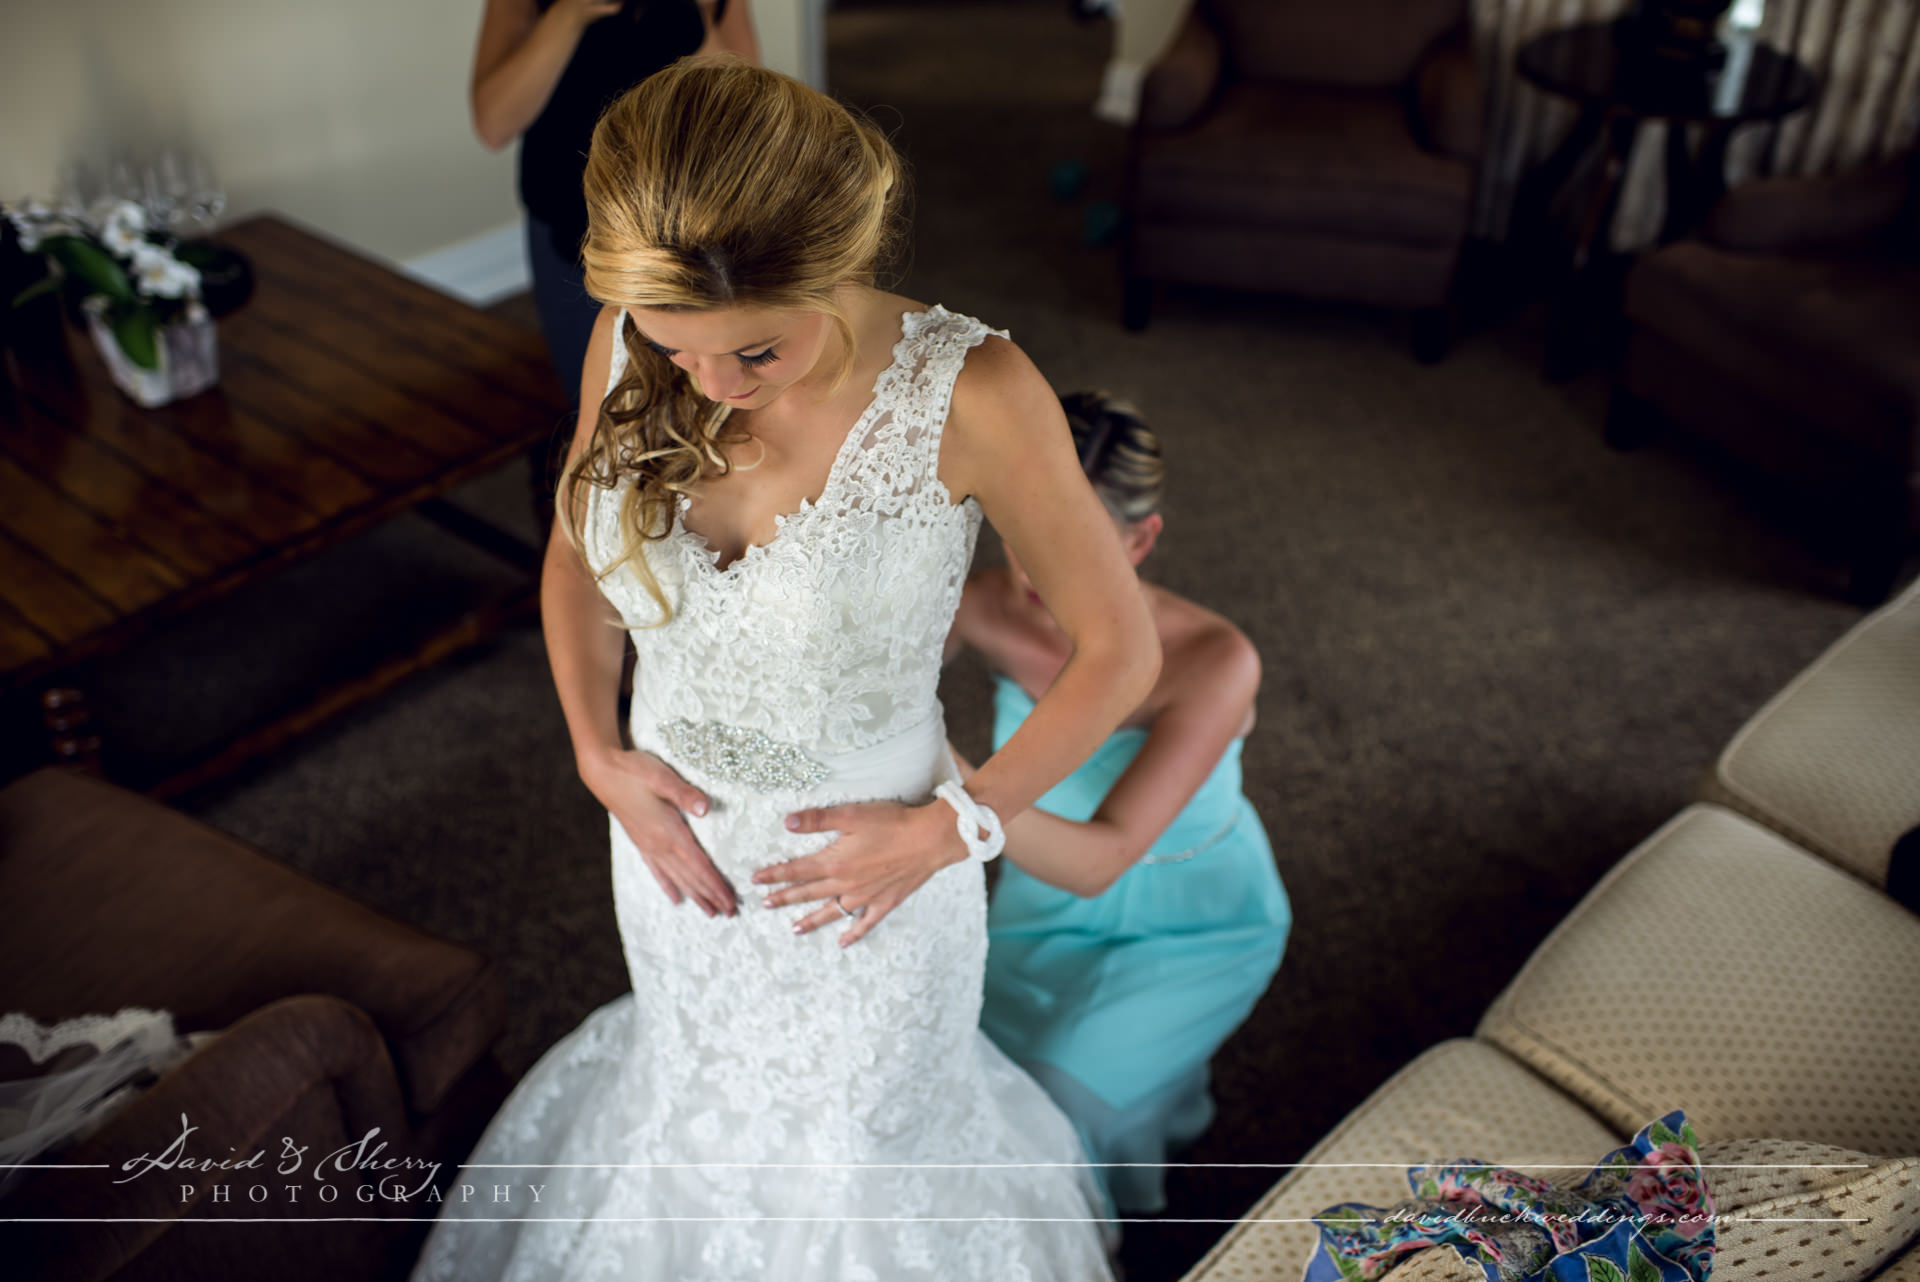 Cobble_Beach_Wedding_Photography_Owen_Sound_10